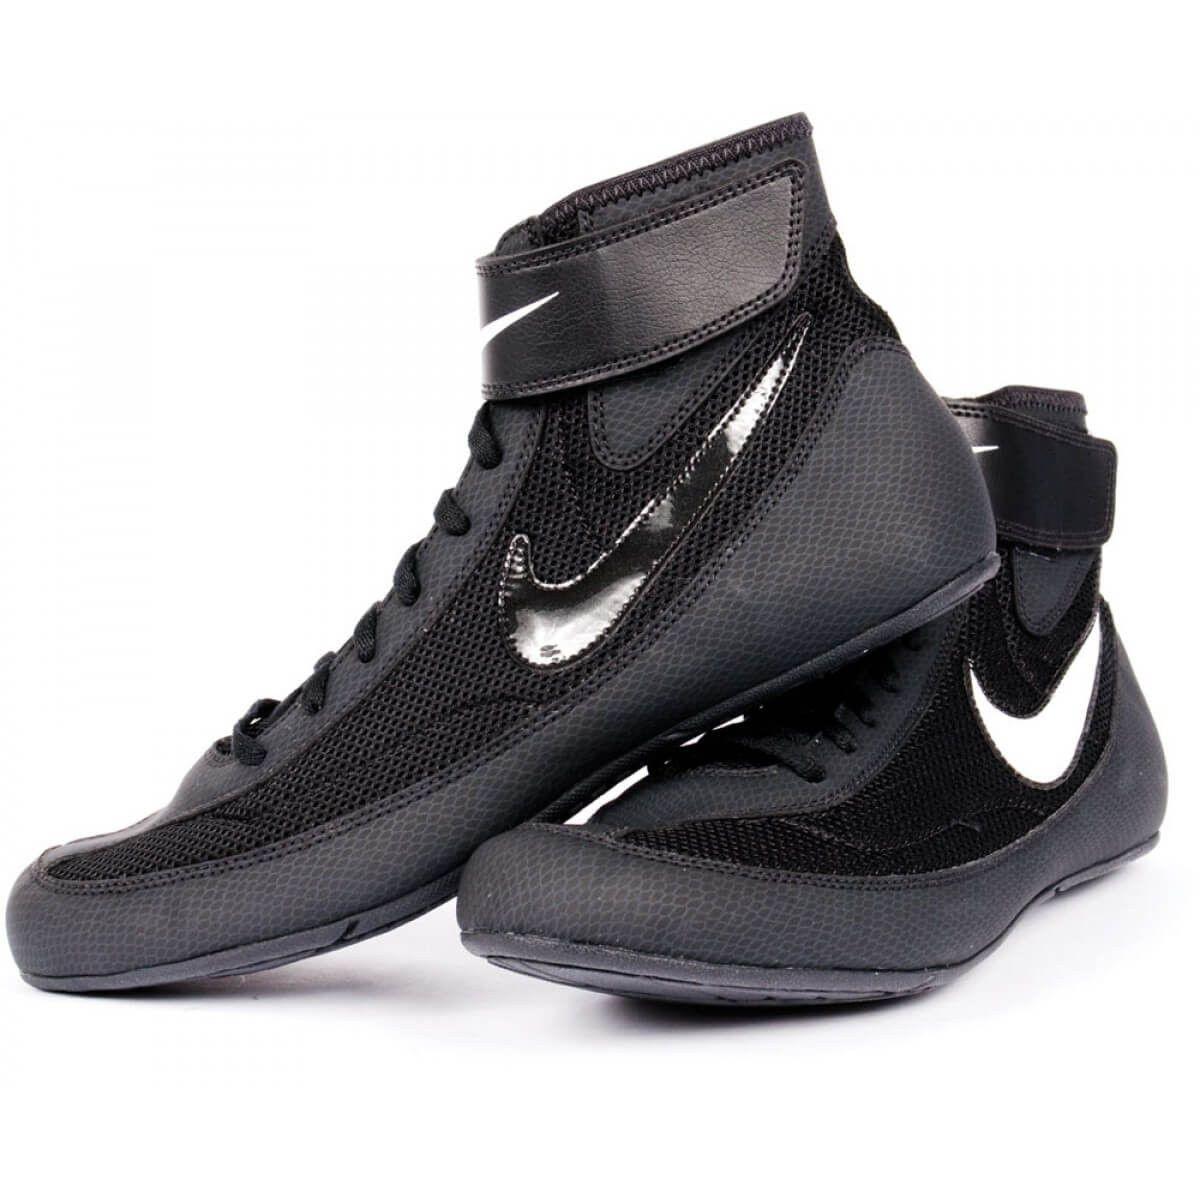 06a99654a2b3b Nike Speedsweep Boxing Shoes | djalxb | Shoes, Nike, Sneakers nike